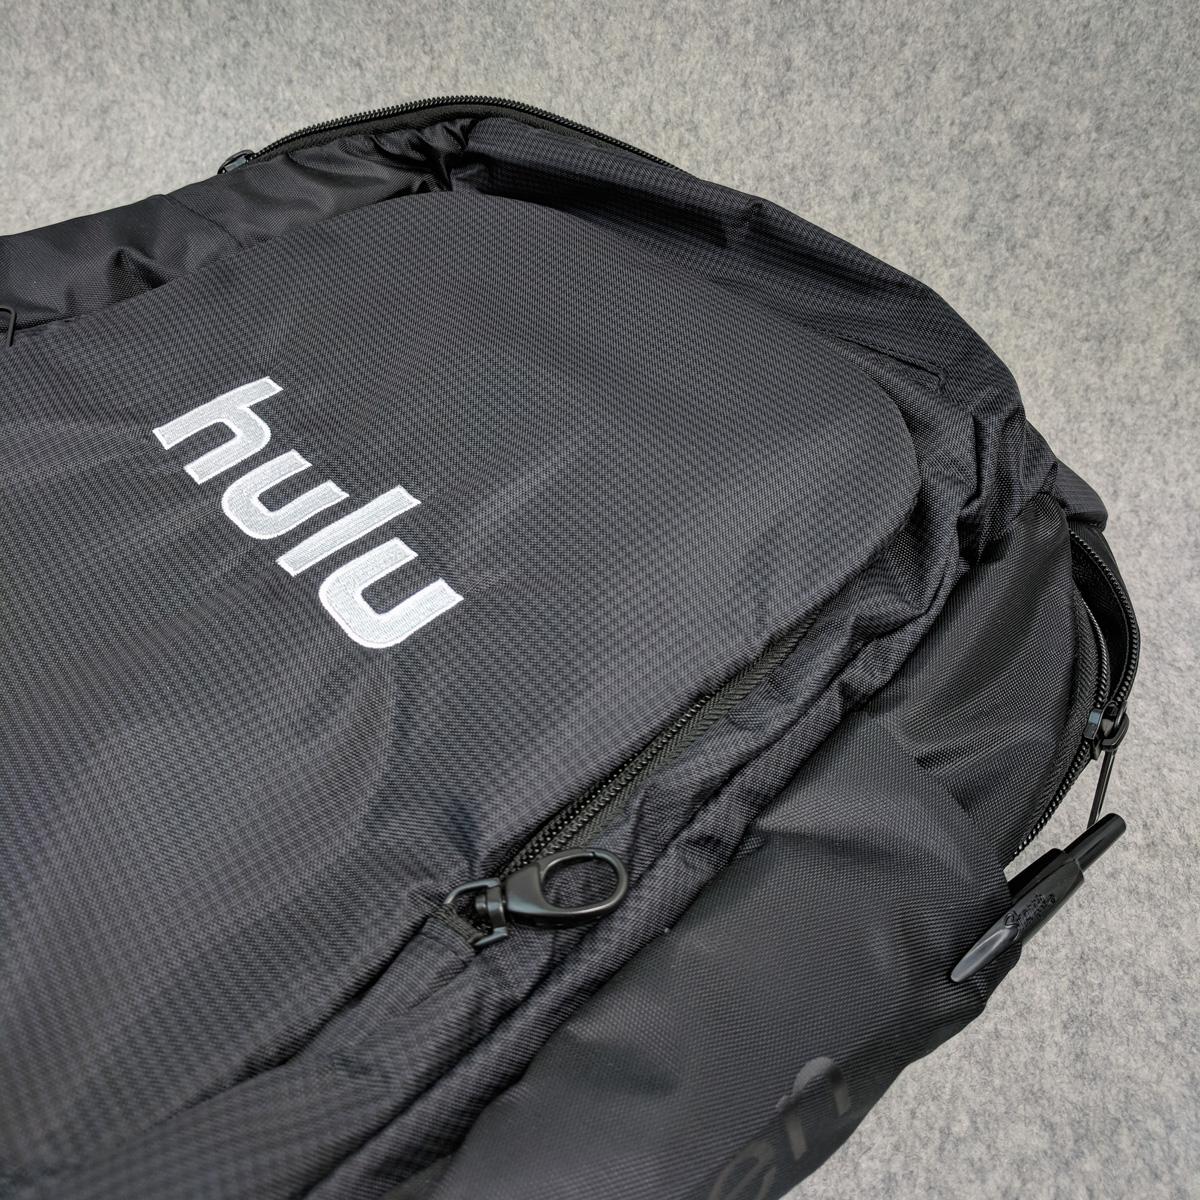 oniracom_backpack_comotion.jpg